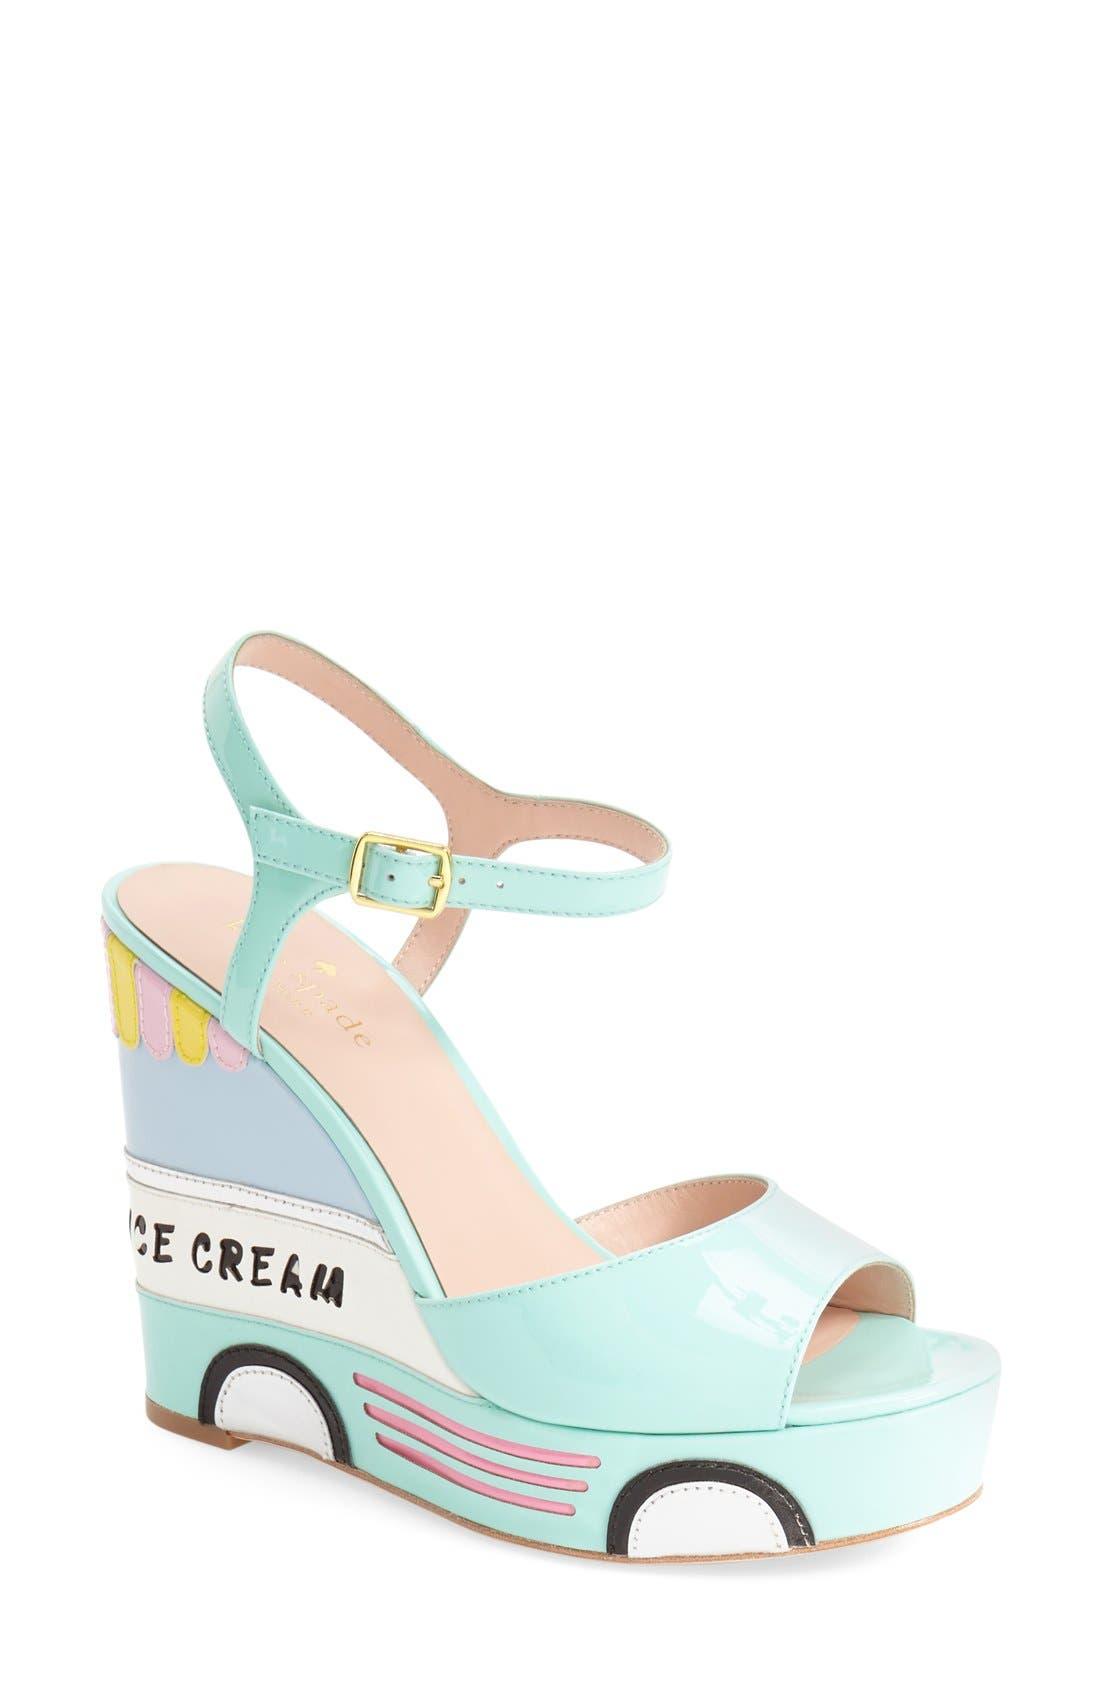 Alternate Image 1 Selected - kate spade new york 'dotty' wedge sandal (Women)